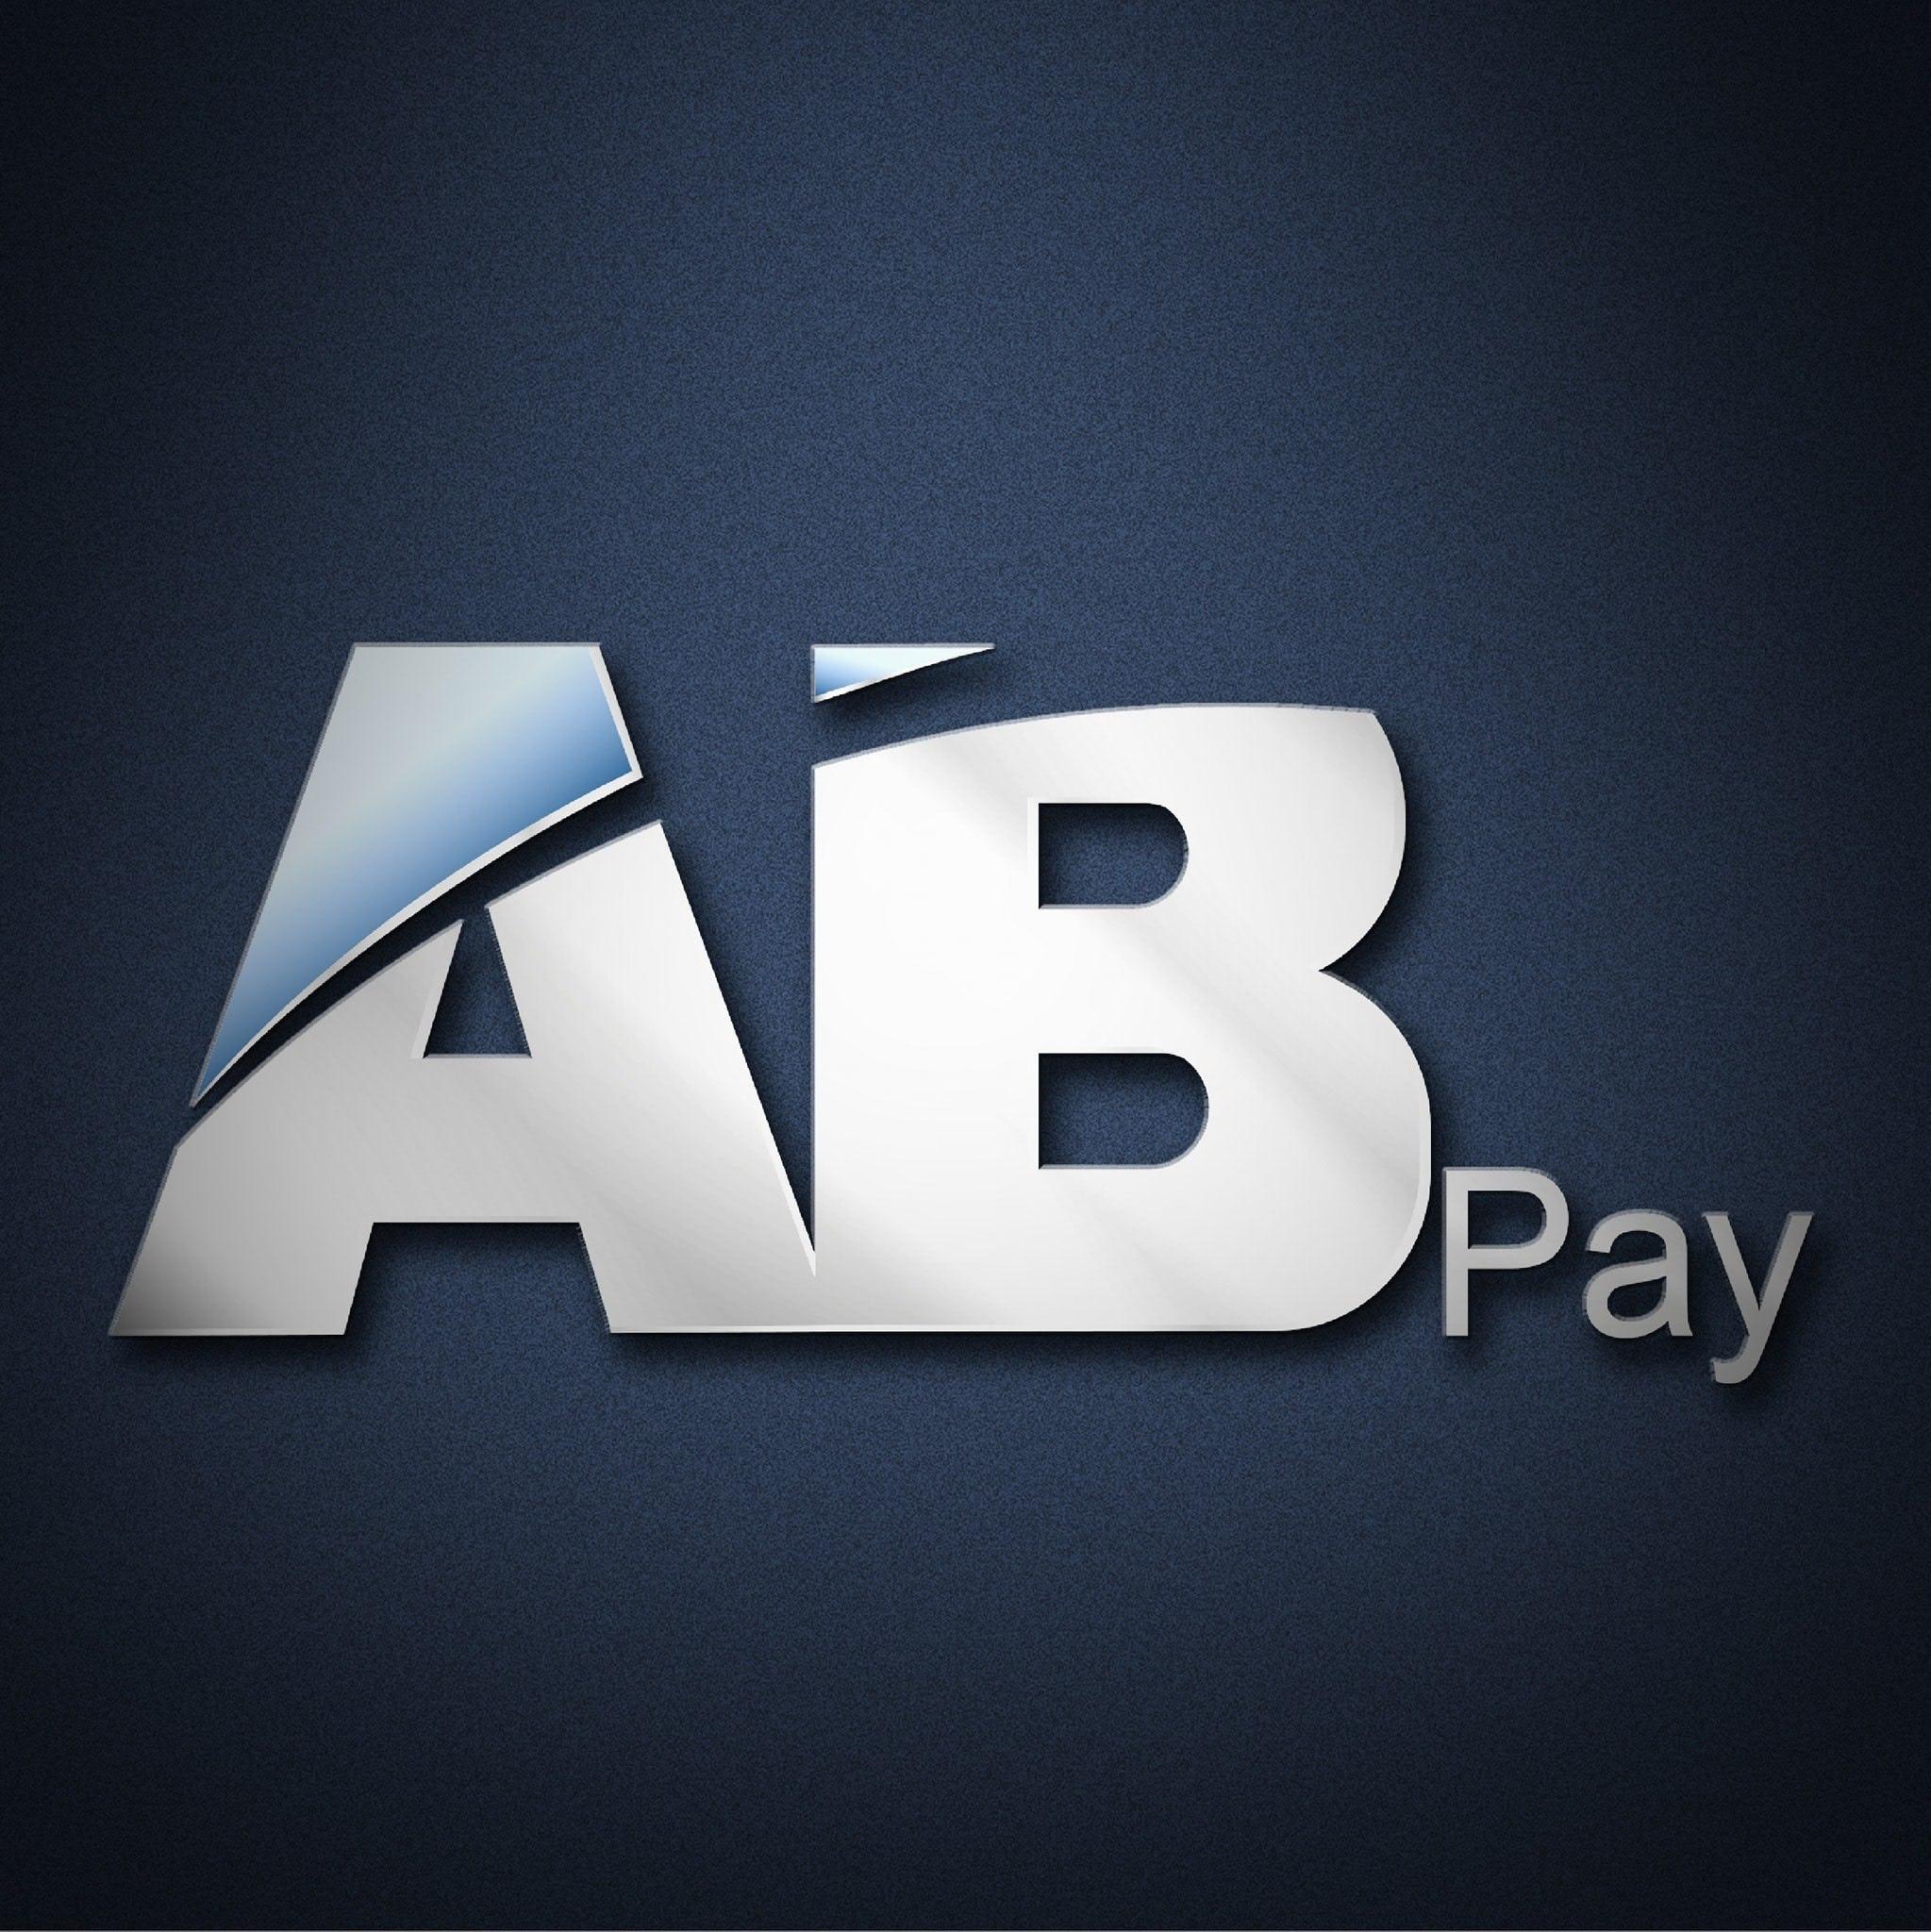 AB Pay